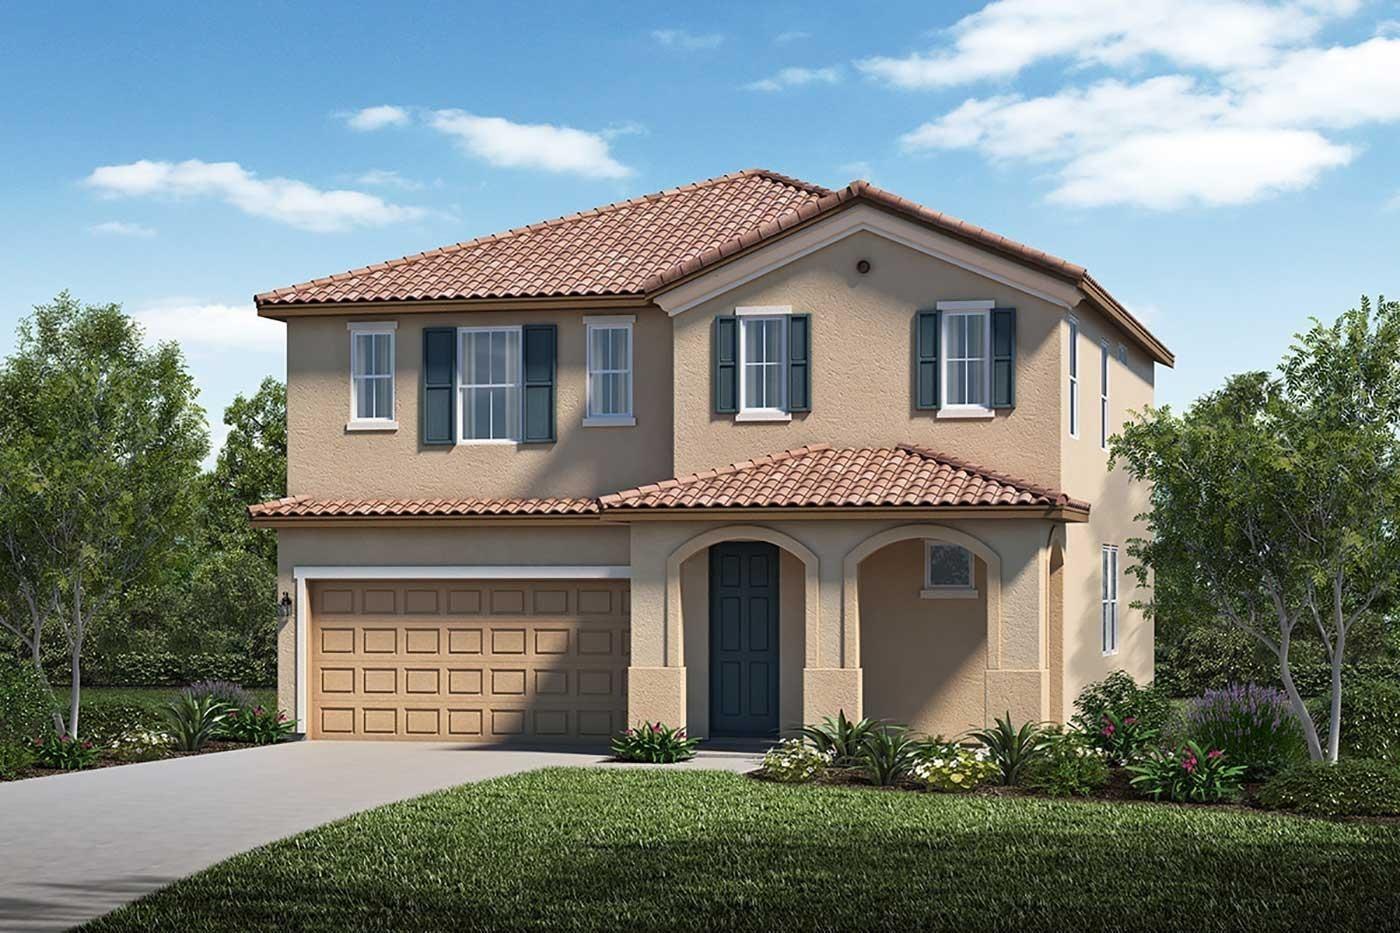 10843 Albano Lane, Stockton, CA 95209 - MLS#: 221129396